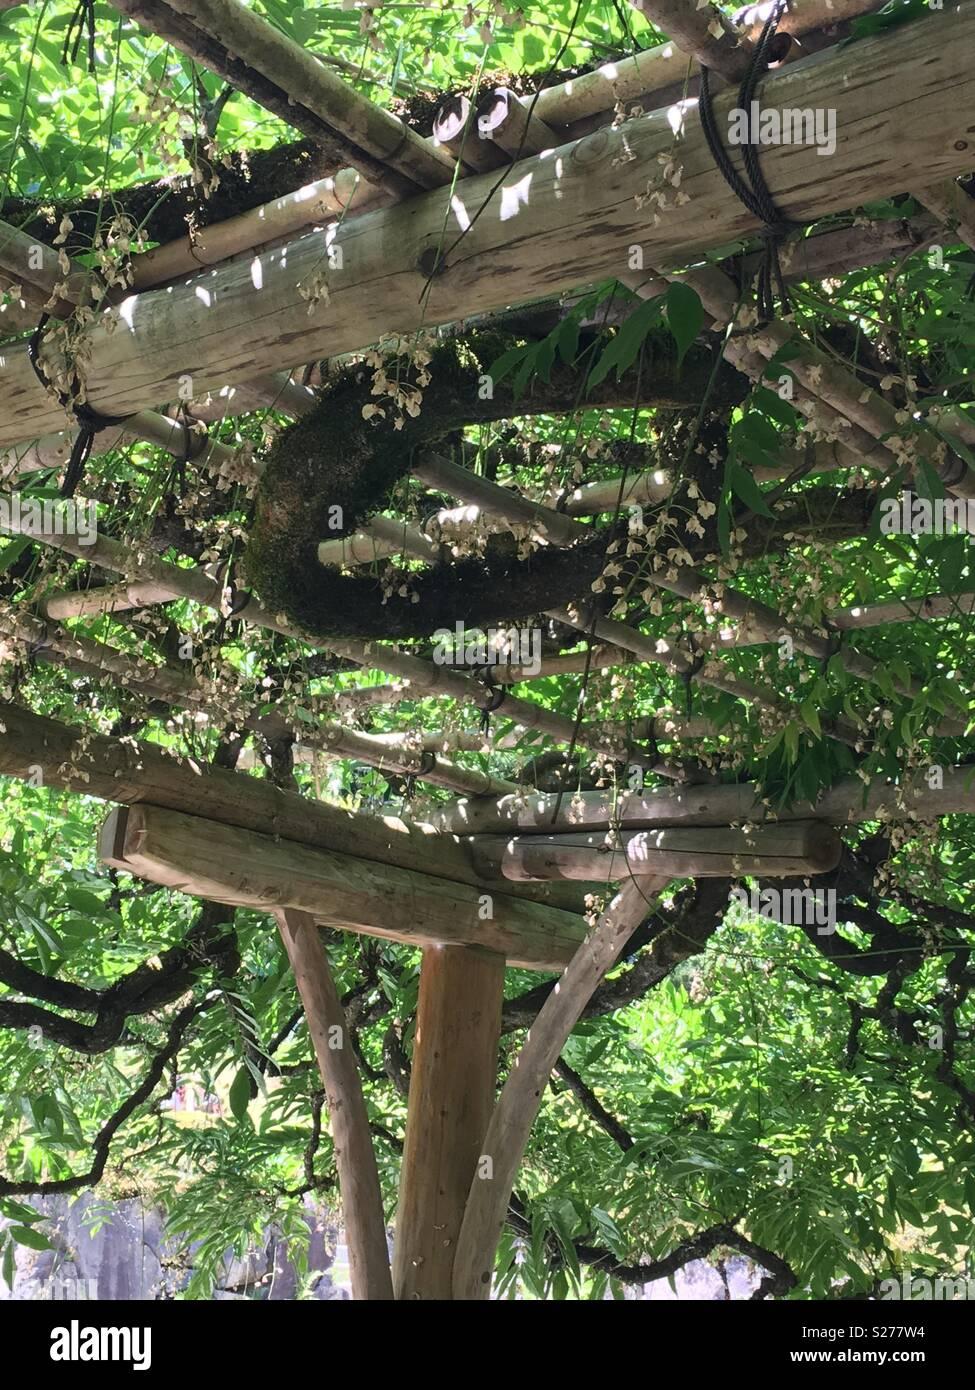 grape vine pergola on a warm sunny day - Stock Image